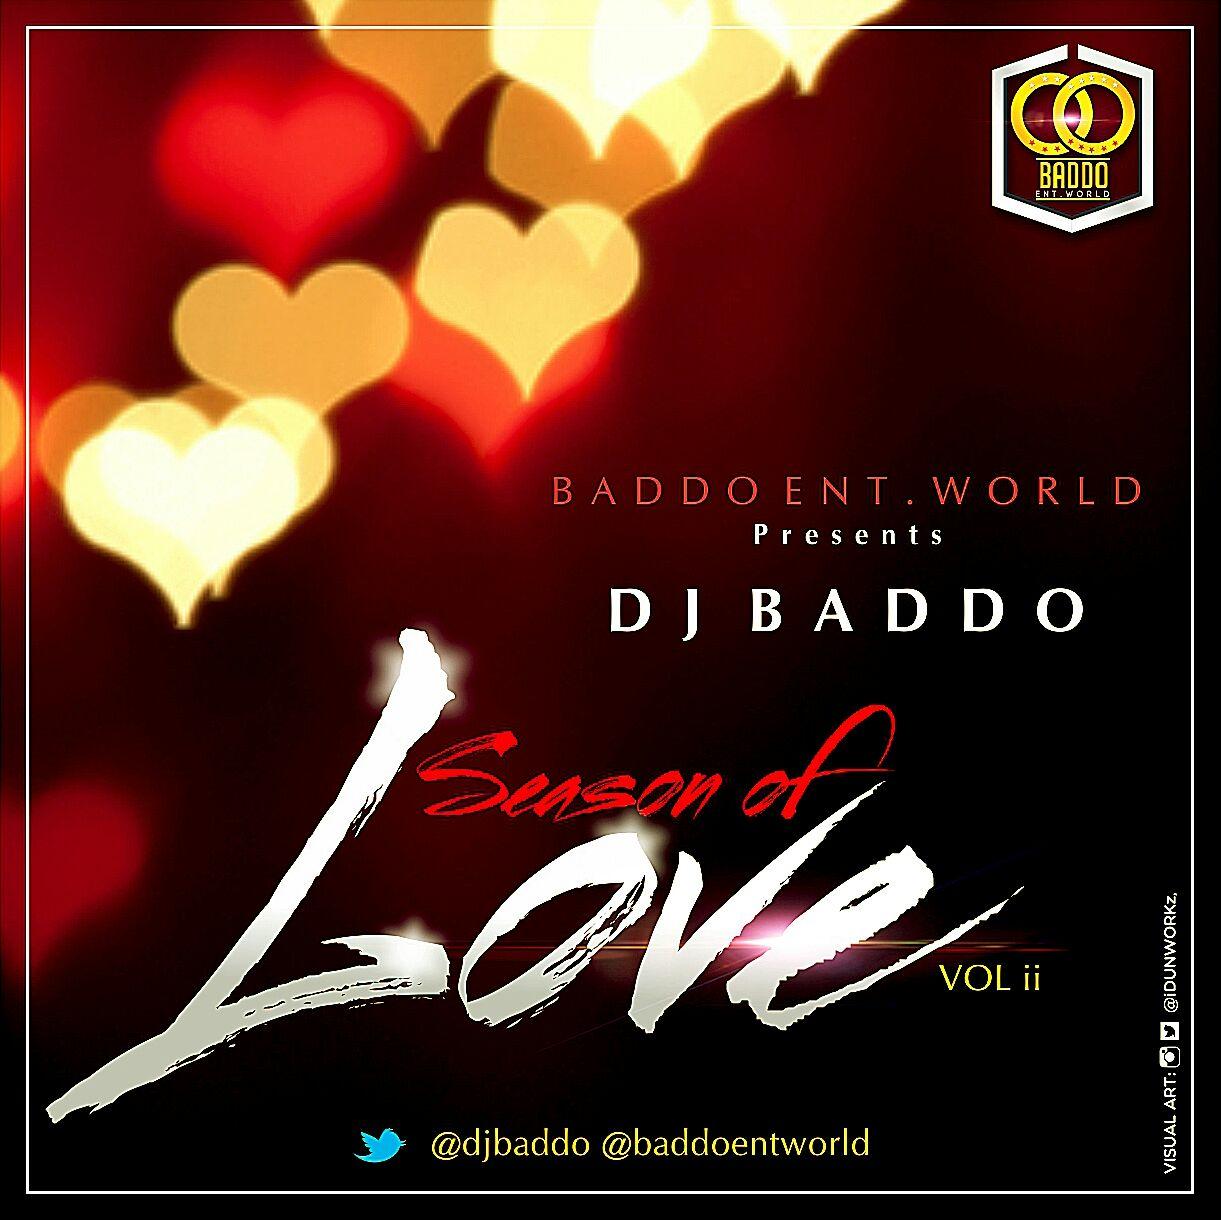 DJ BADDO SEASON OF LOVE VOL 2